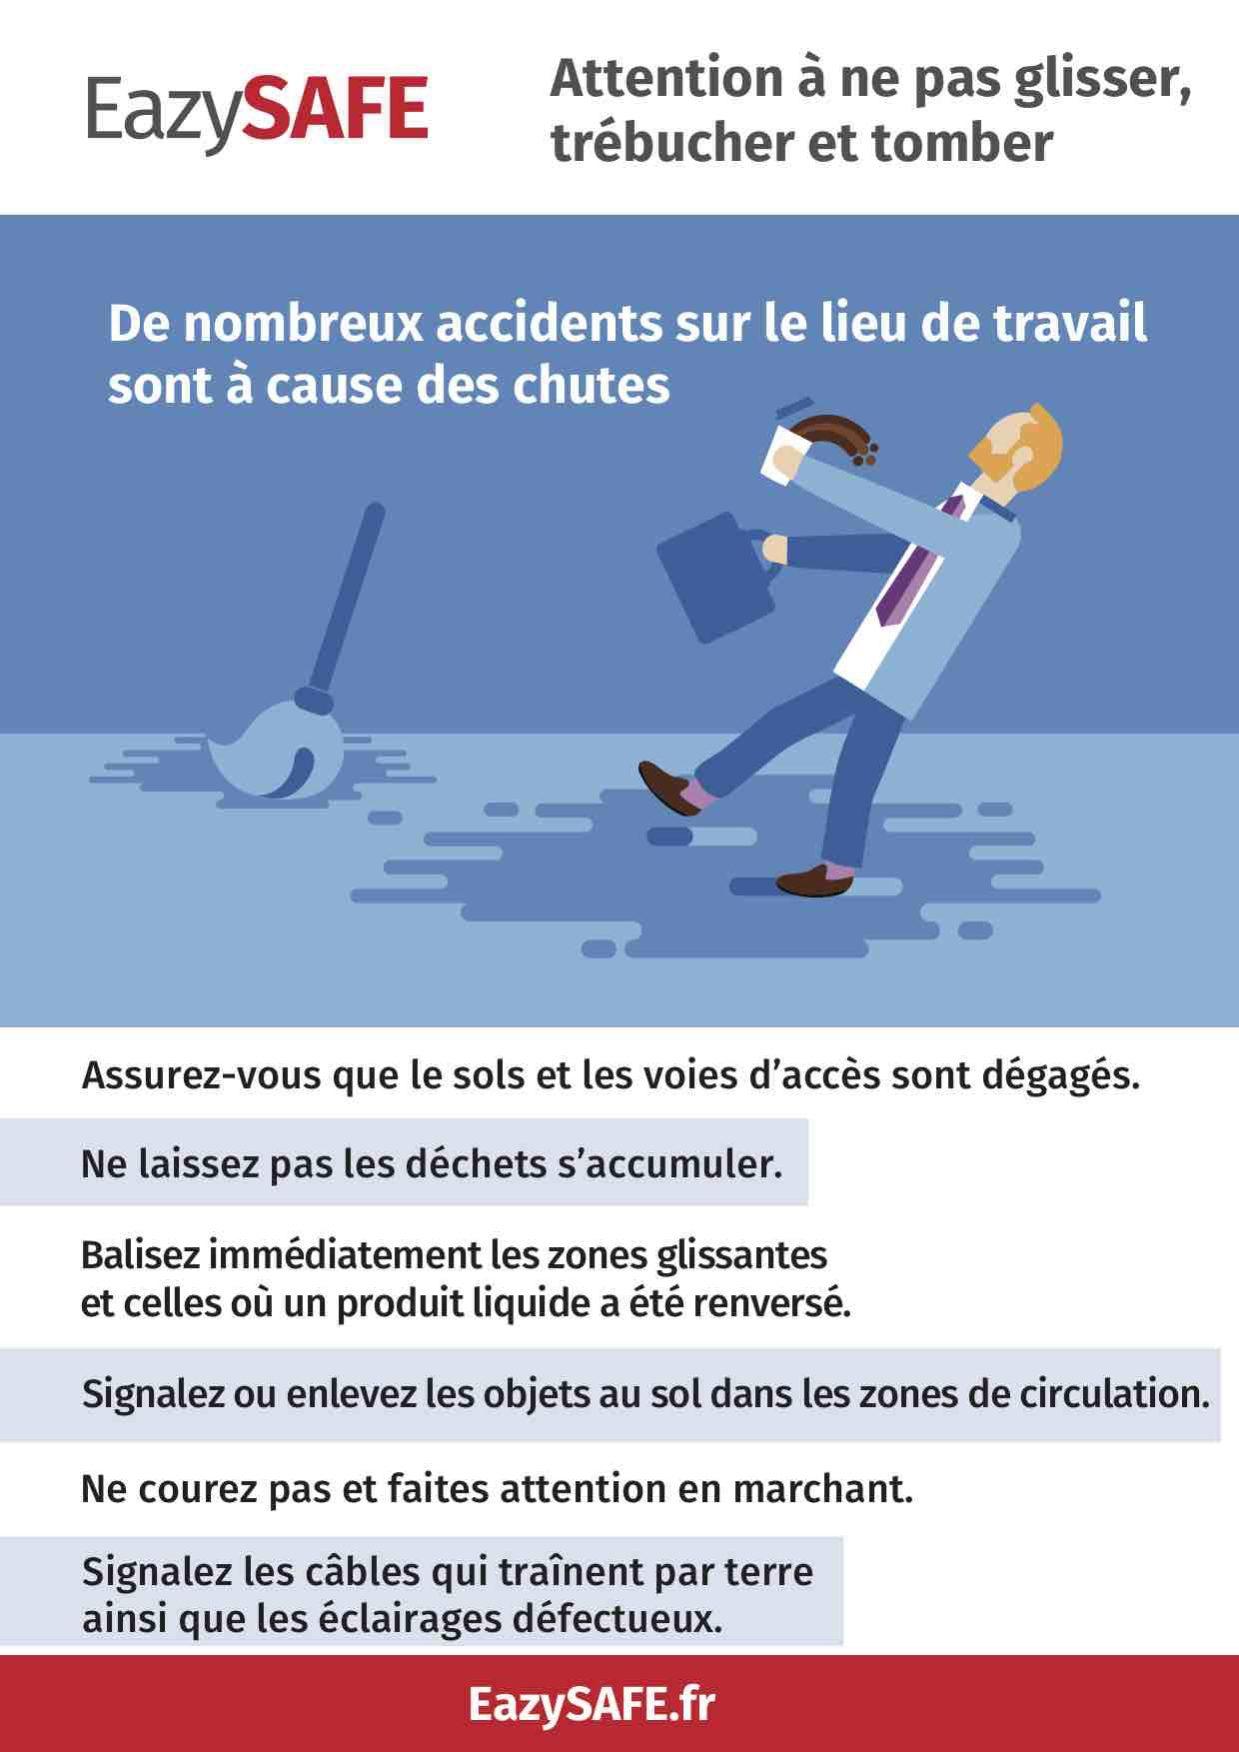 poster accidents chute lieu de travail